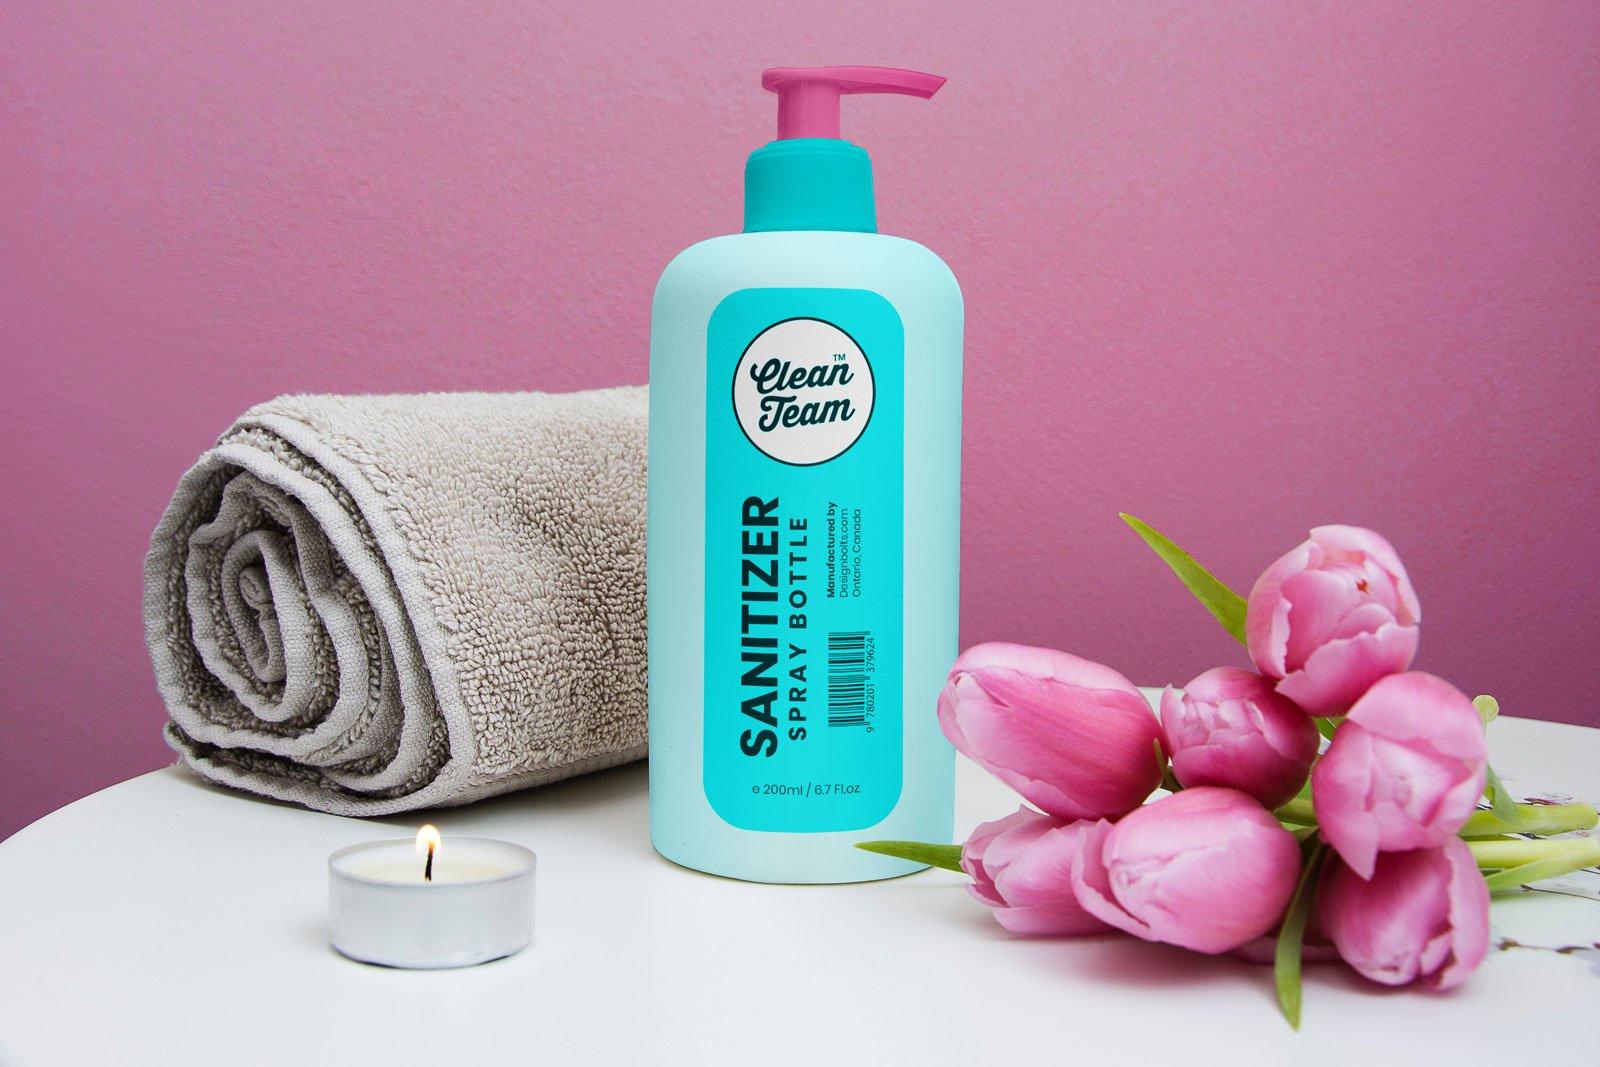 Free Hand Sanitizer Spray Bottle Mockup Psd Designbolts